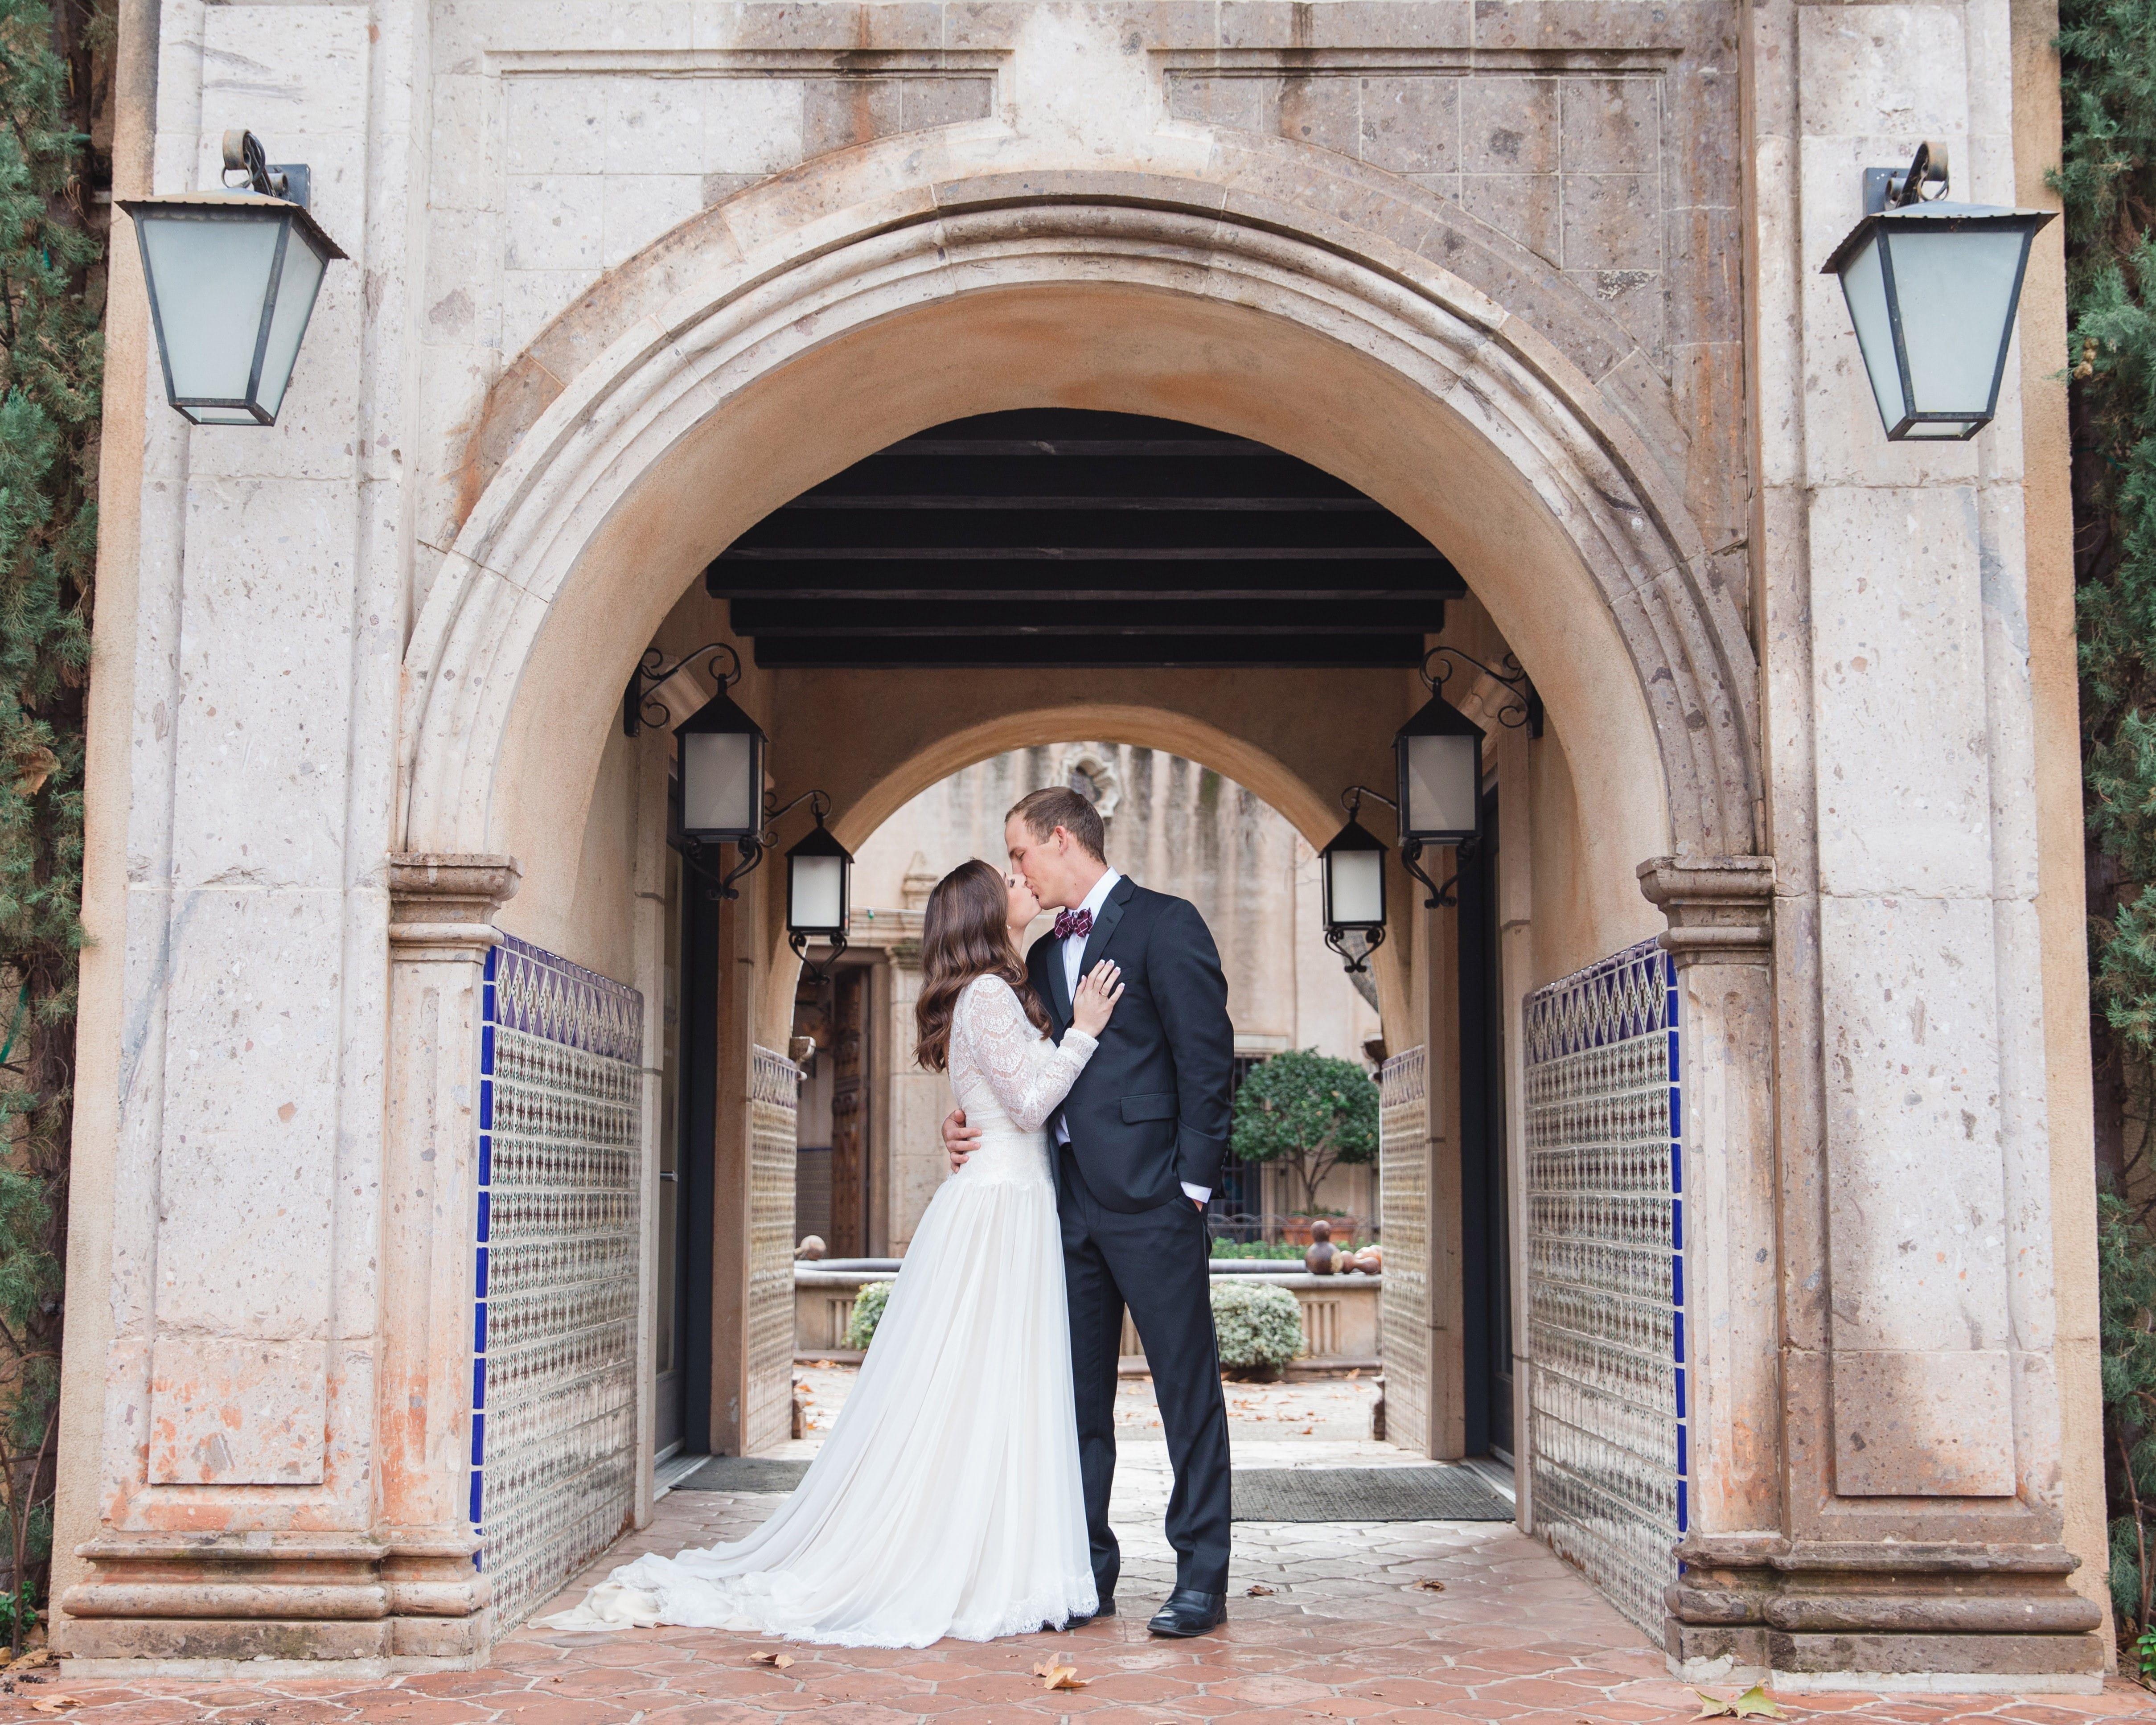 Romantic Villa Wedding Featuring Sleeved Wedding Dress Deirdre